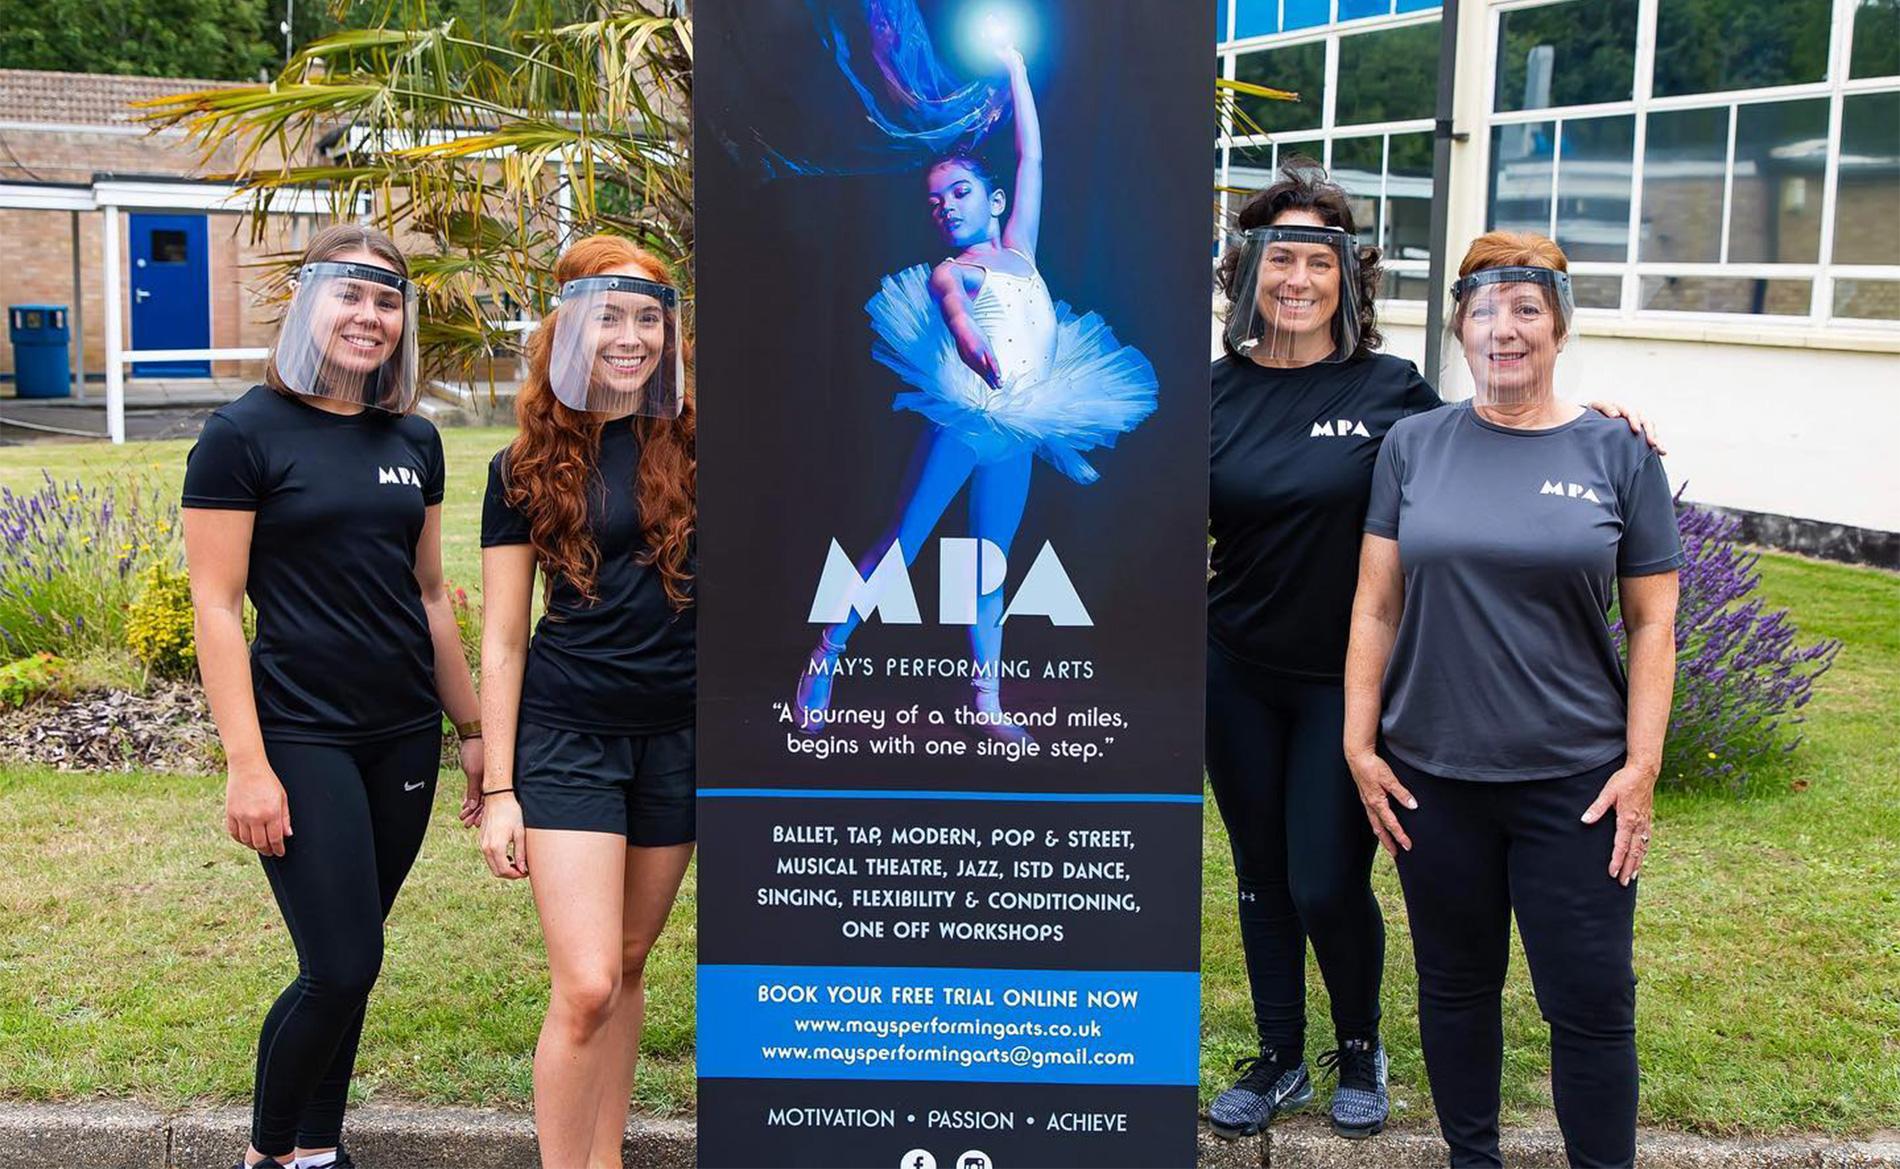 MPA - Mays Performing Arts Norwich.